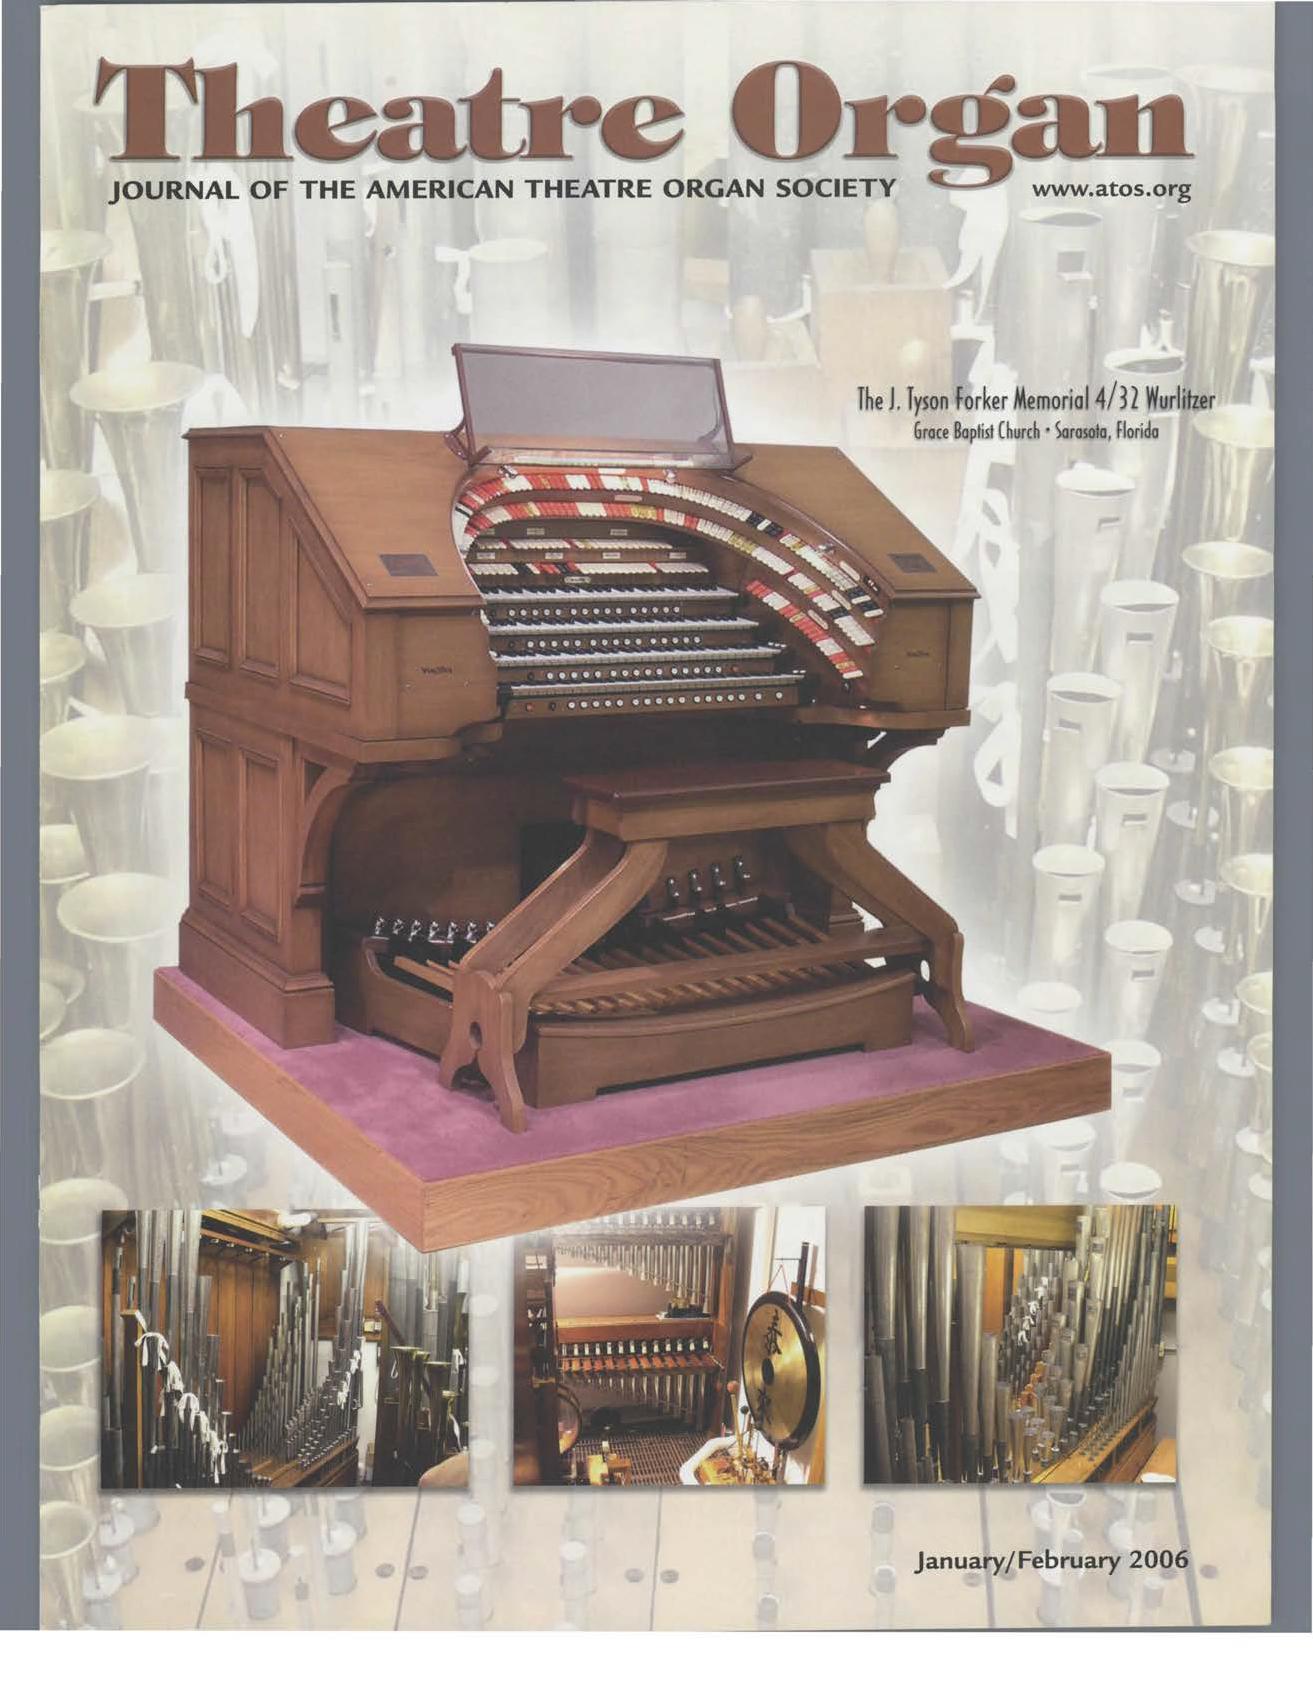 Theatre Organ, January - February 2006, Volume 48, Number 1